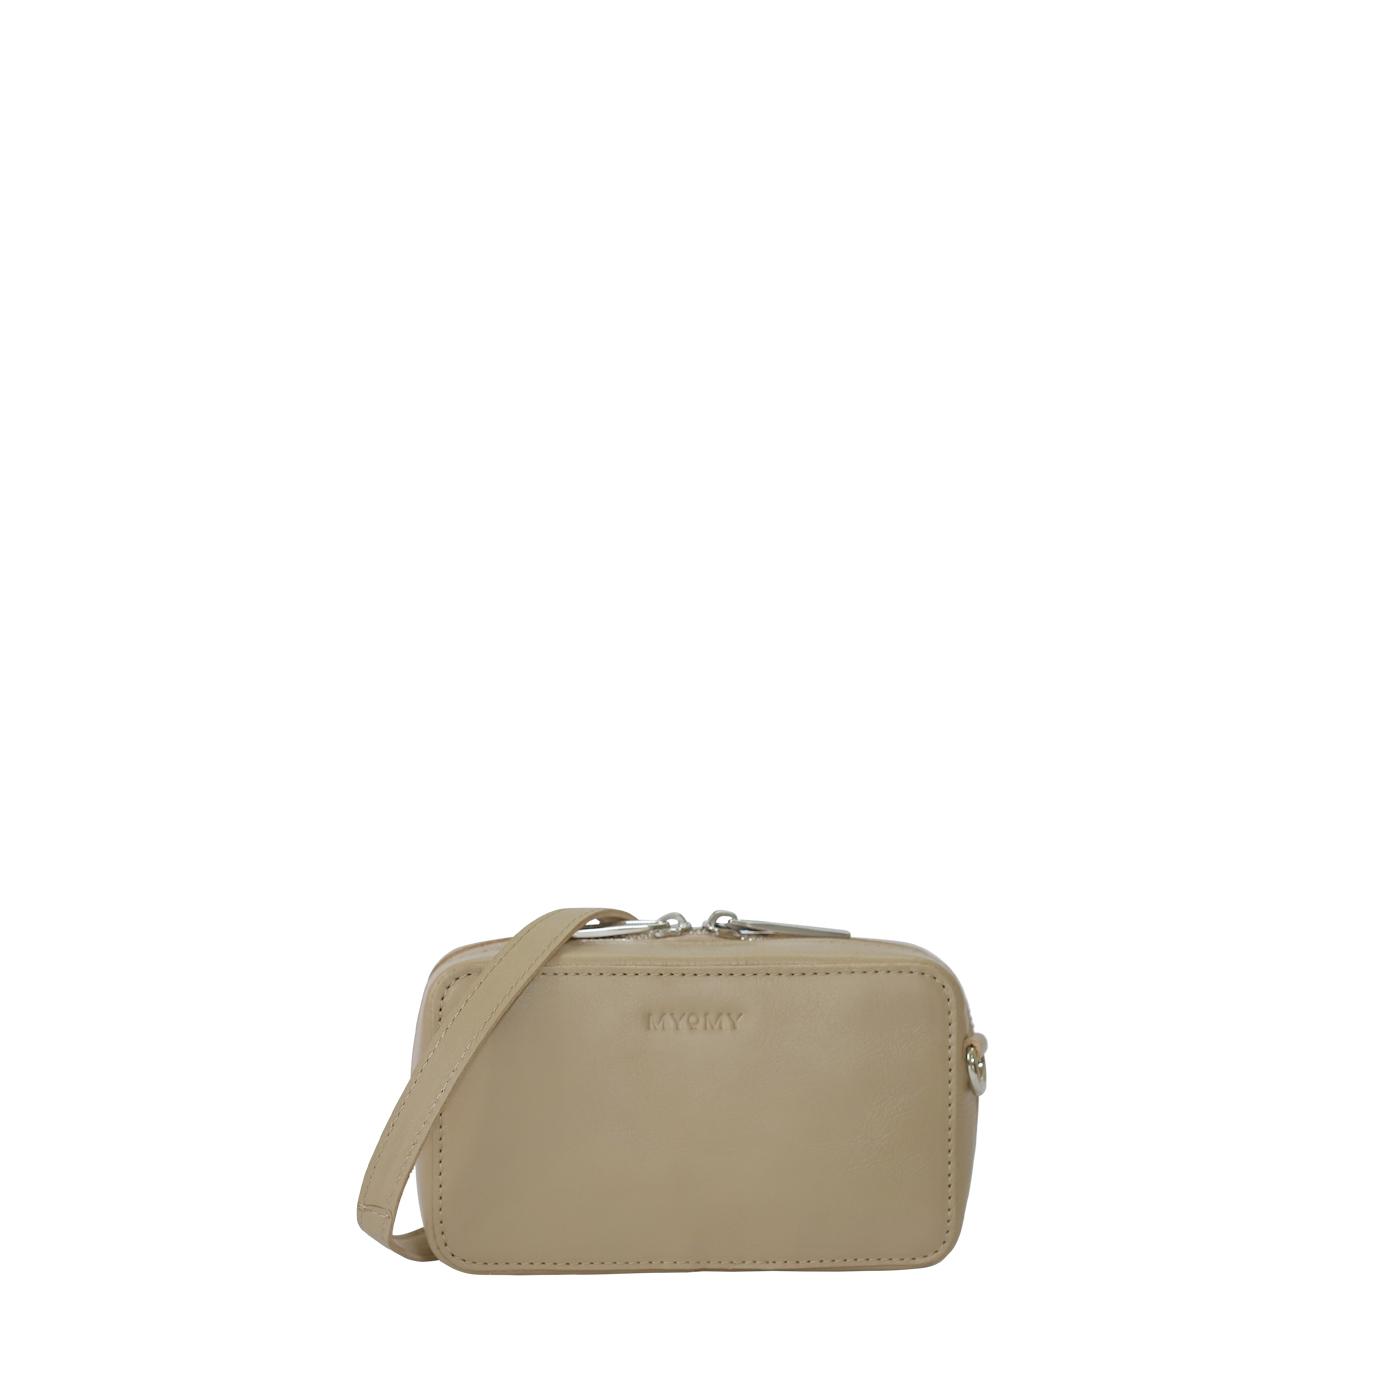 MY BOXY BAG Camera with belt - sand